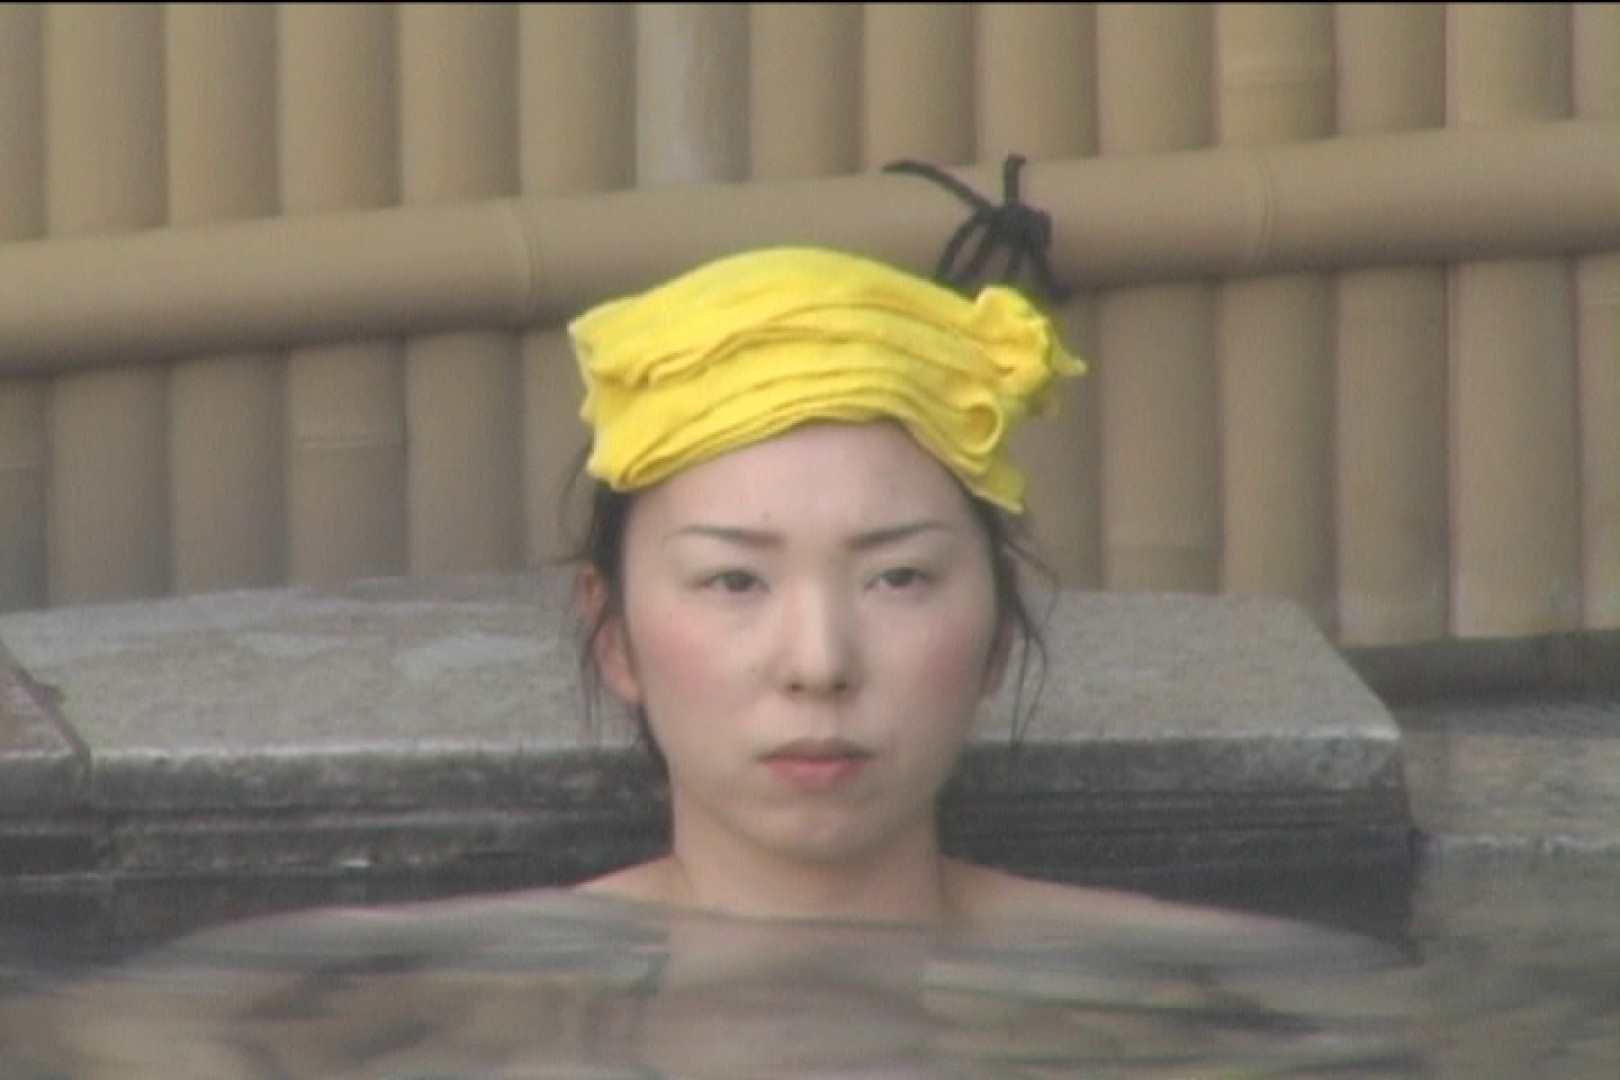 Aquaな露天風呂Vol.529 盗撮映像  51Pix 19